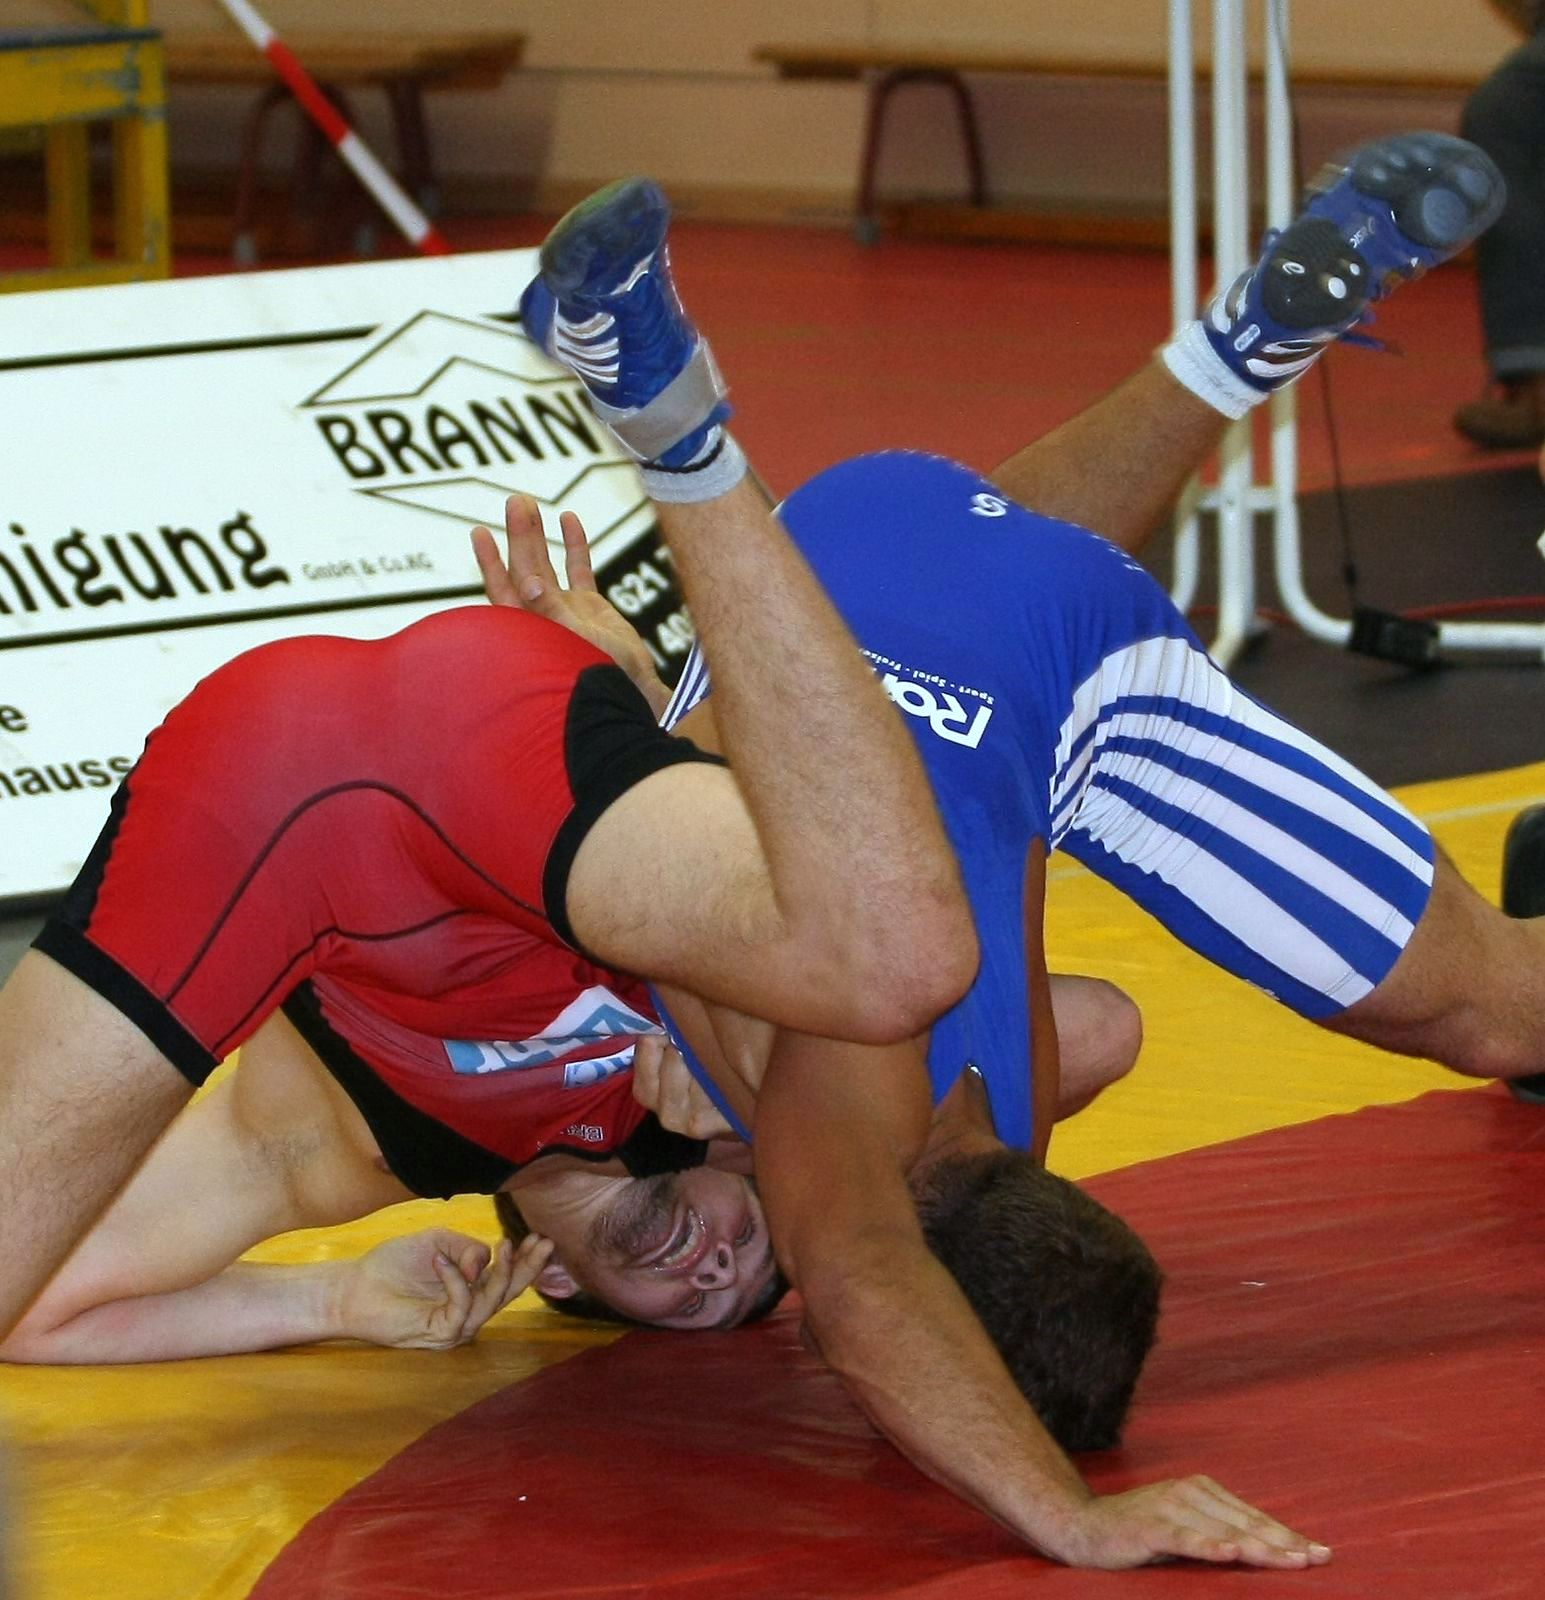 wrestling world: German wrestling: Potsdam vs Untergriesbach